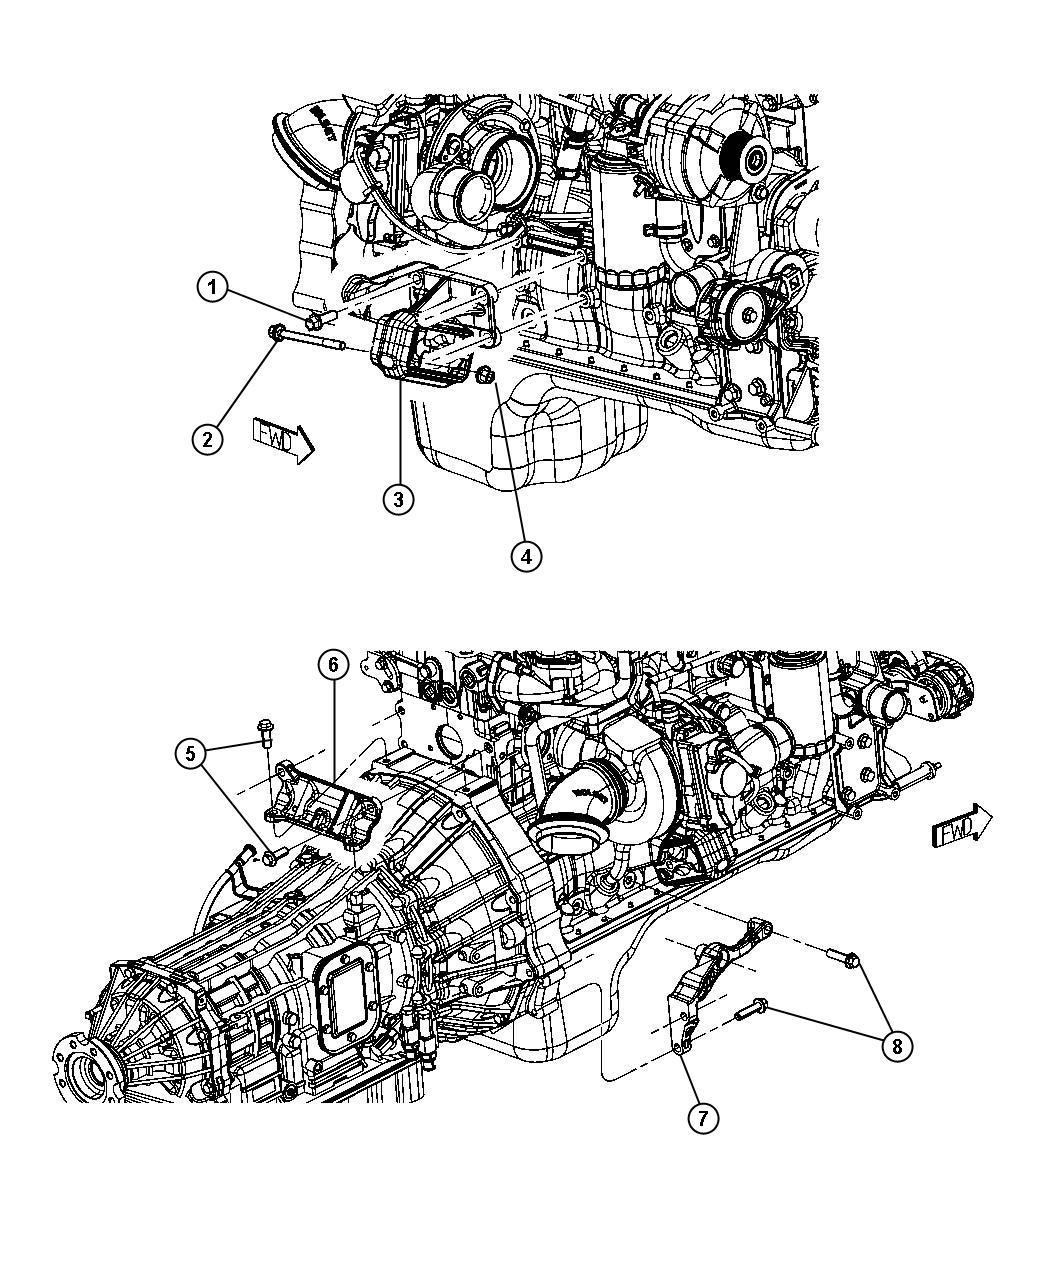 2008 Dodge Ram 5500 Bracket. Engine mount. Right, right